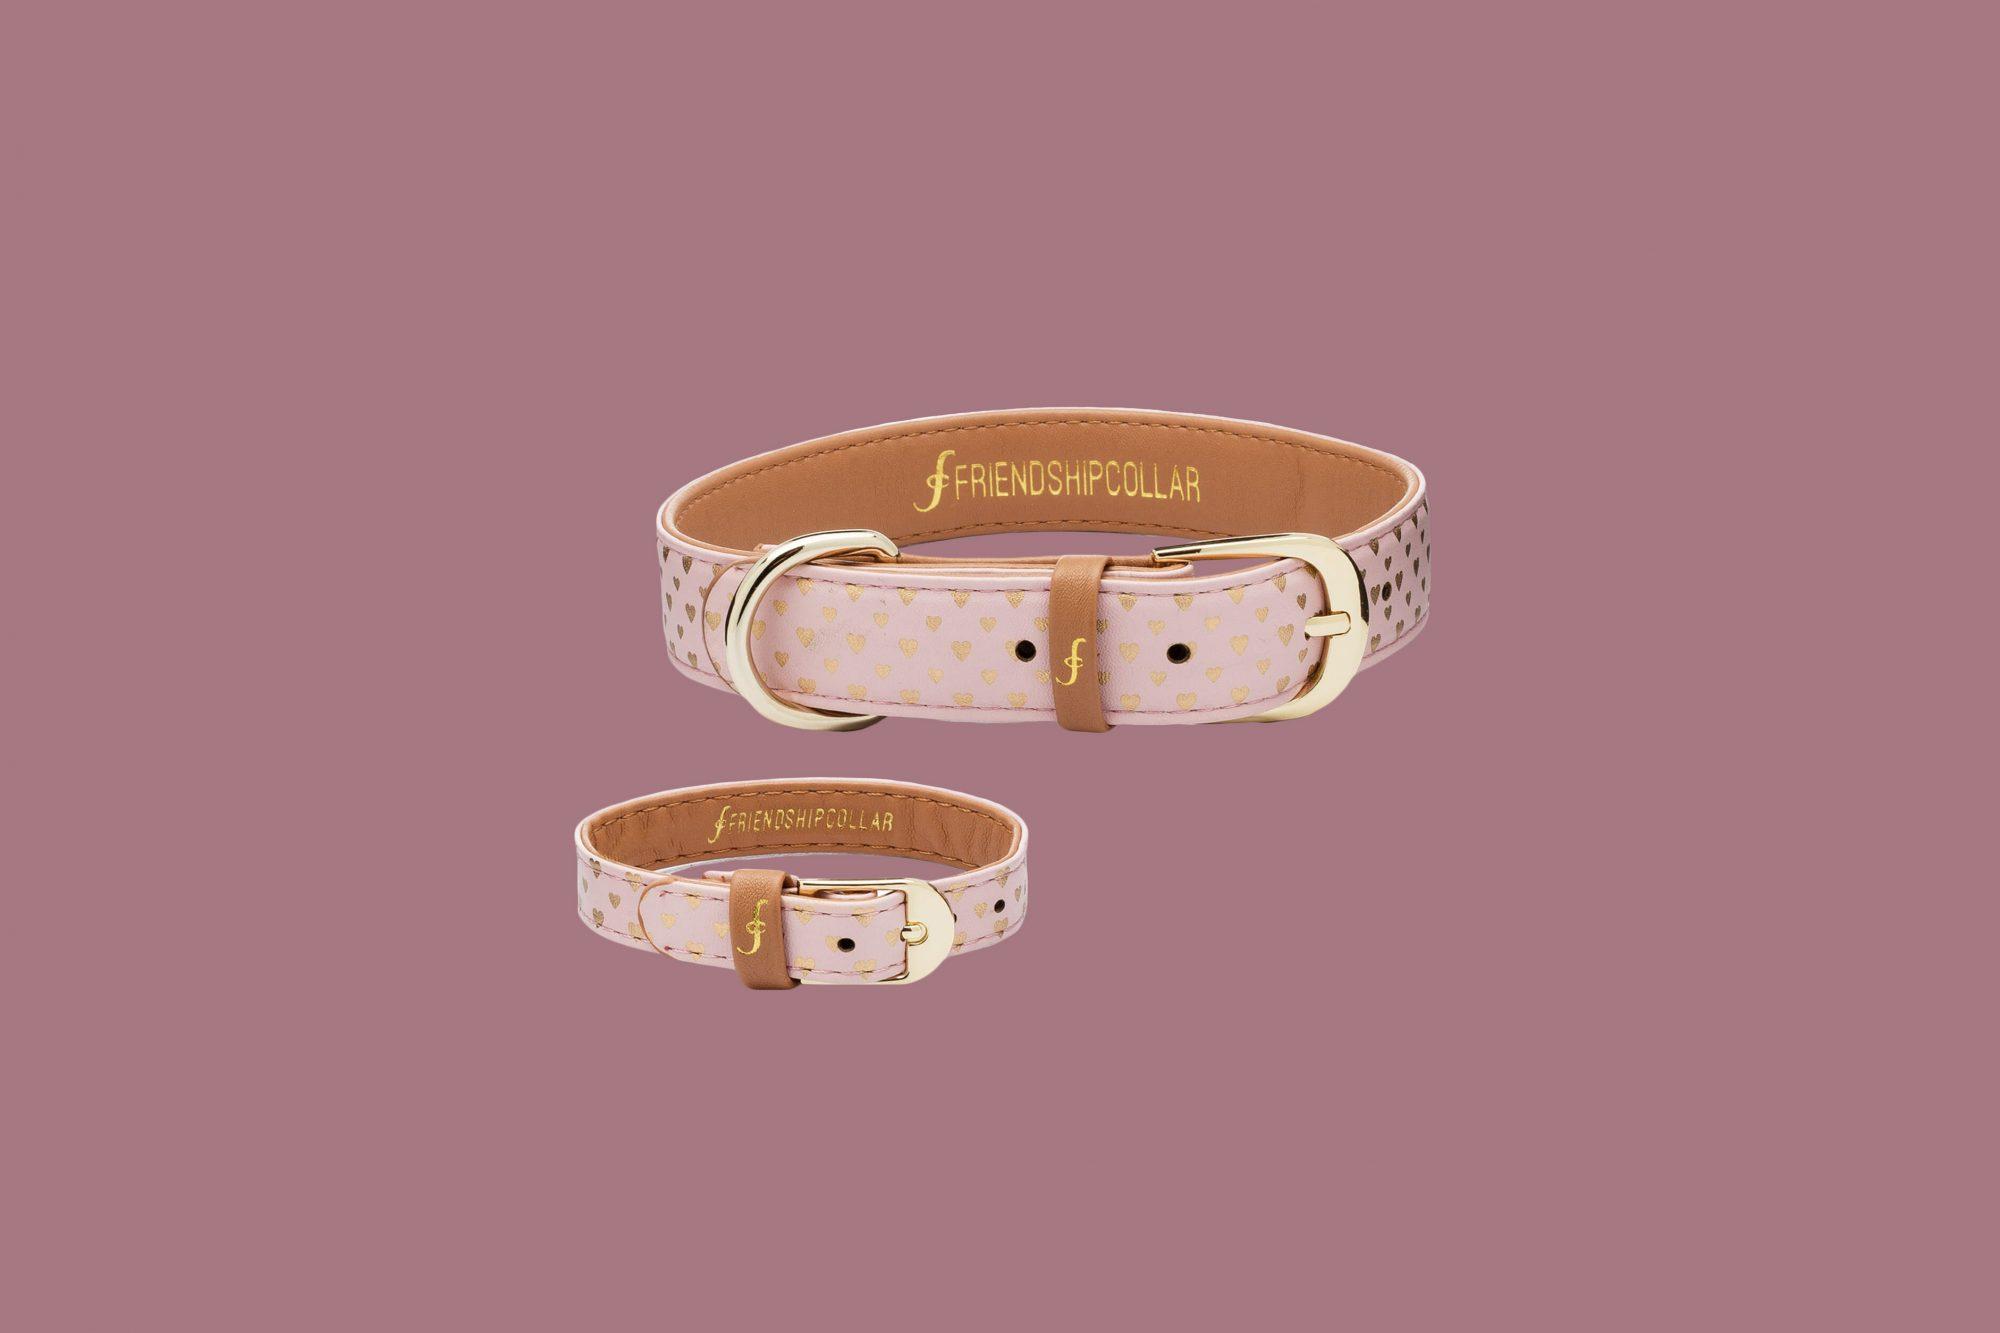 Friendship Collar Puppy Love Collar and Bracelet